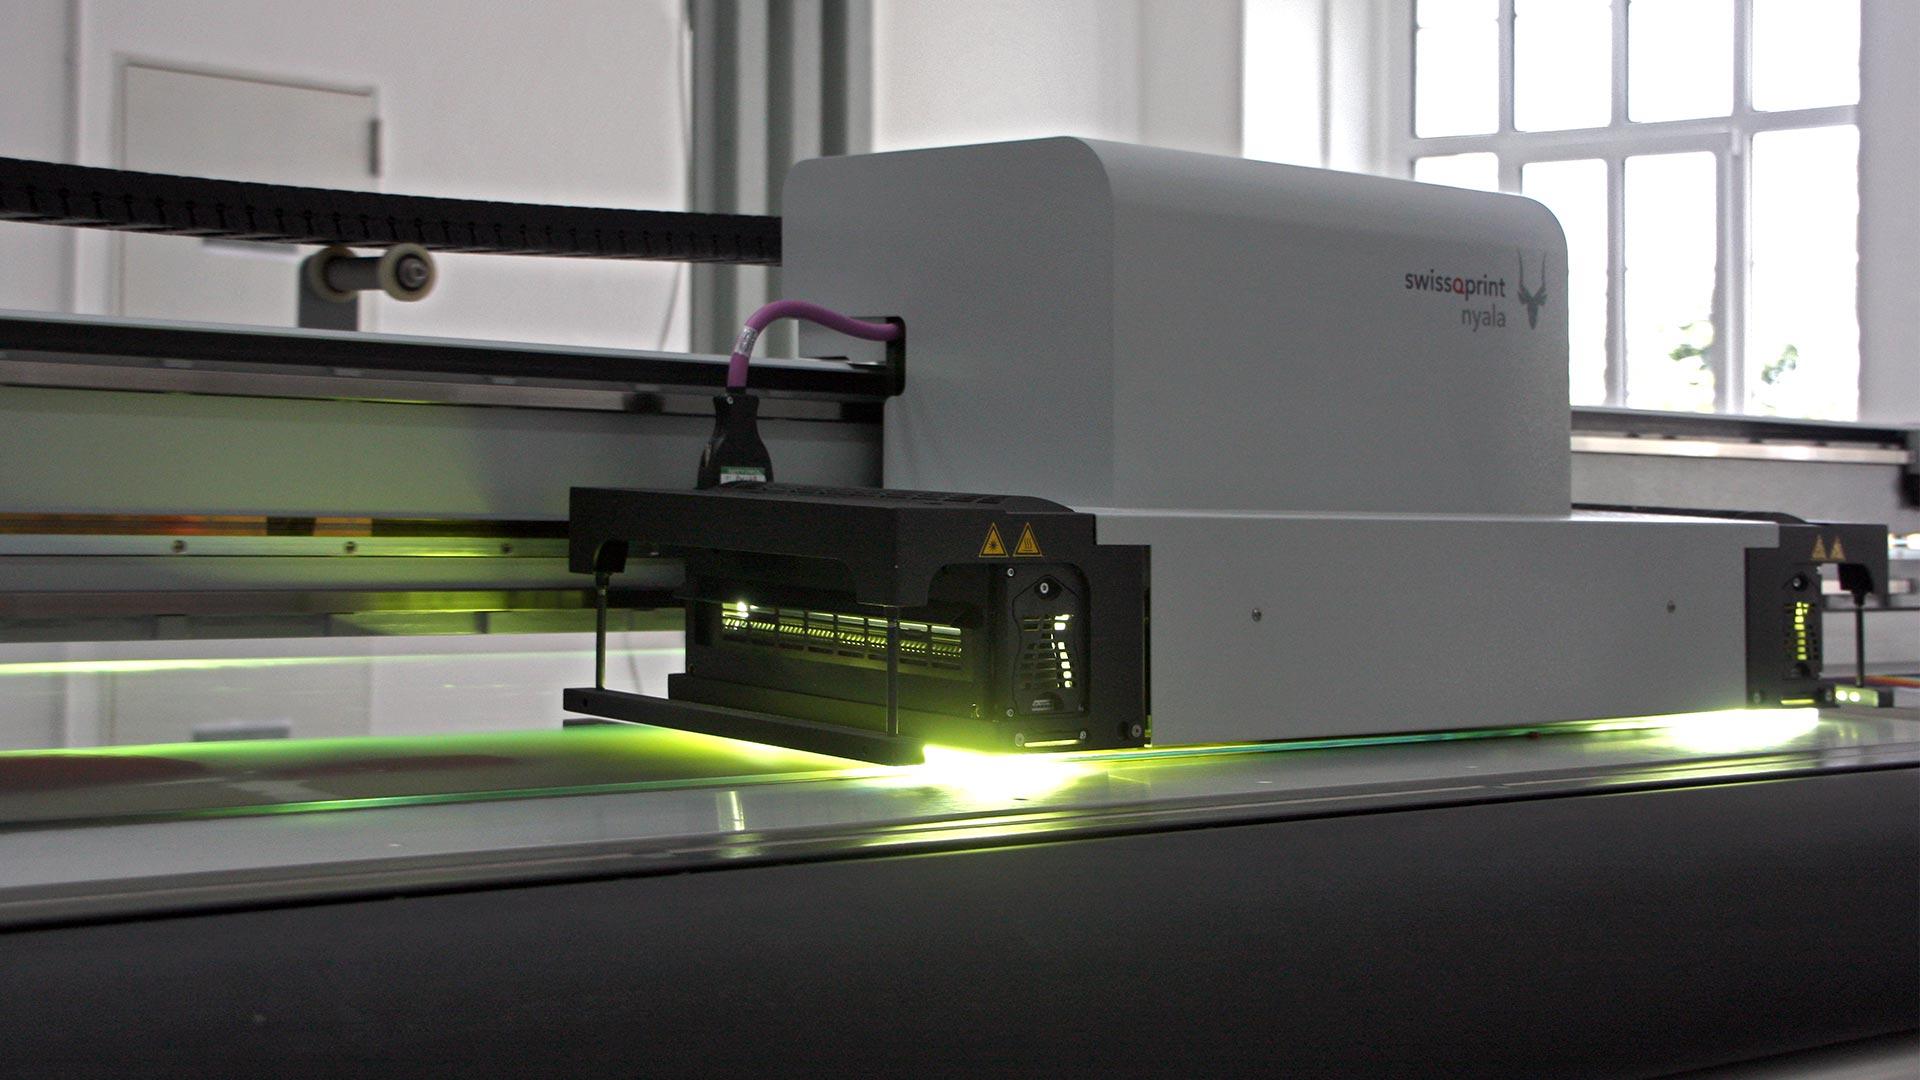 UV Direktdruck